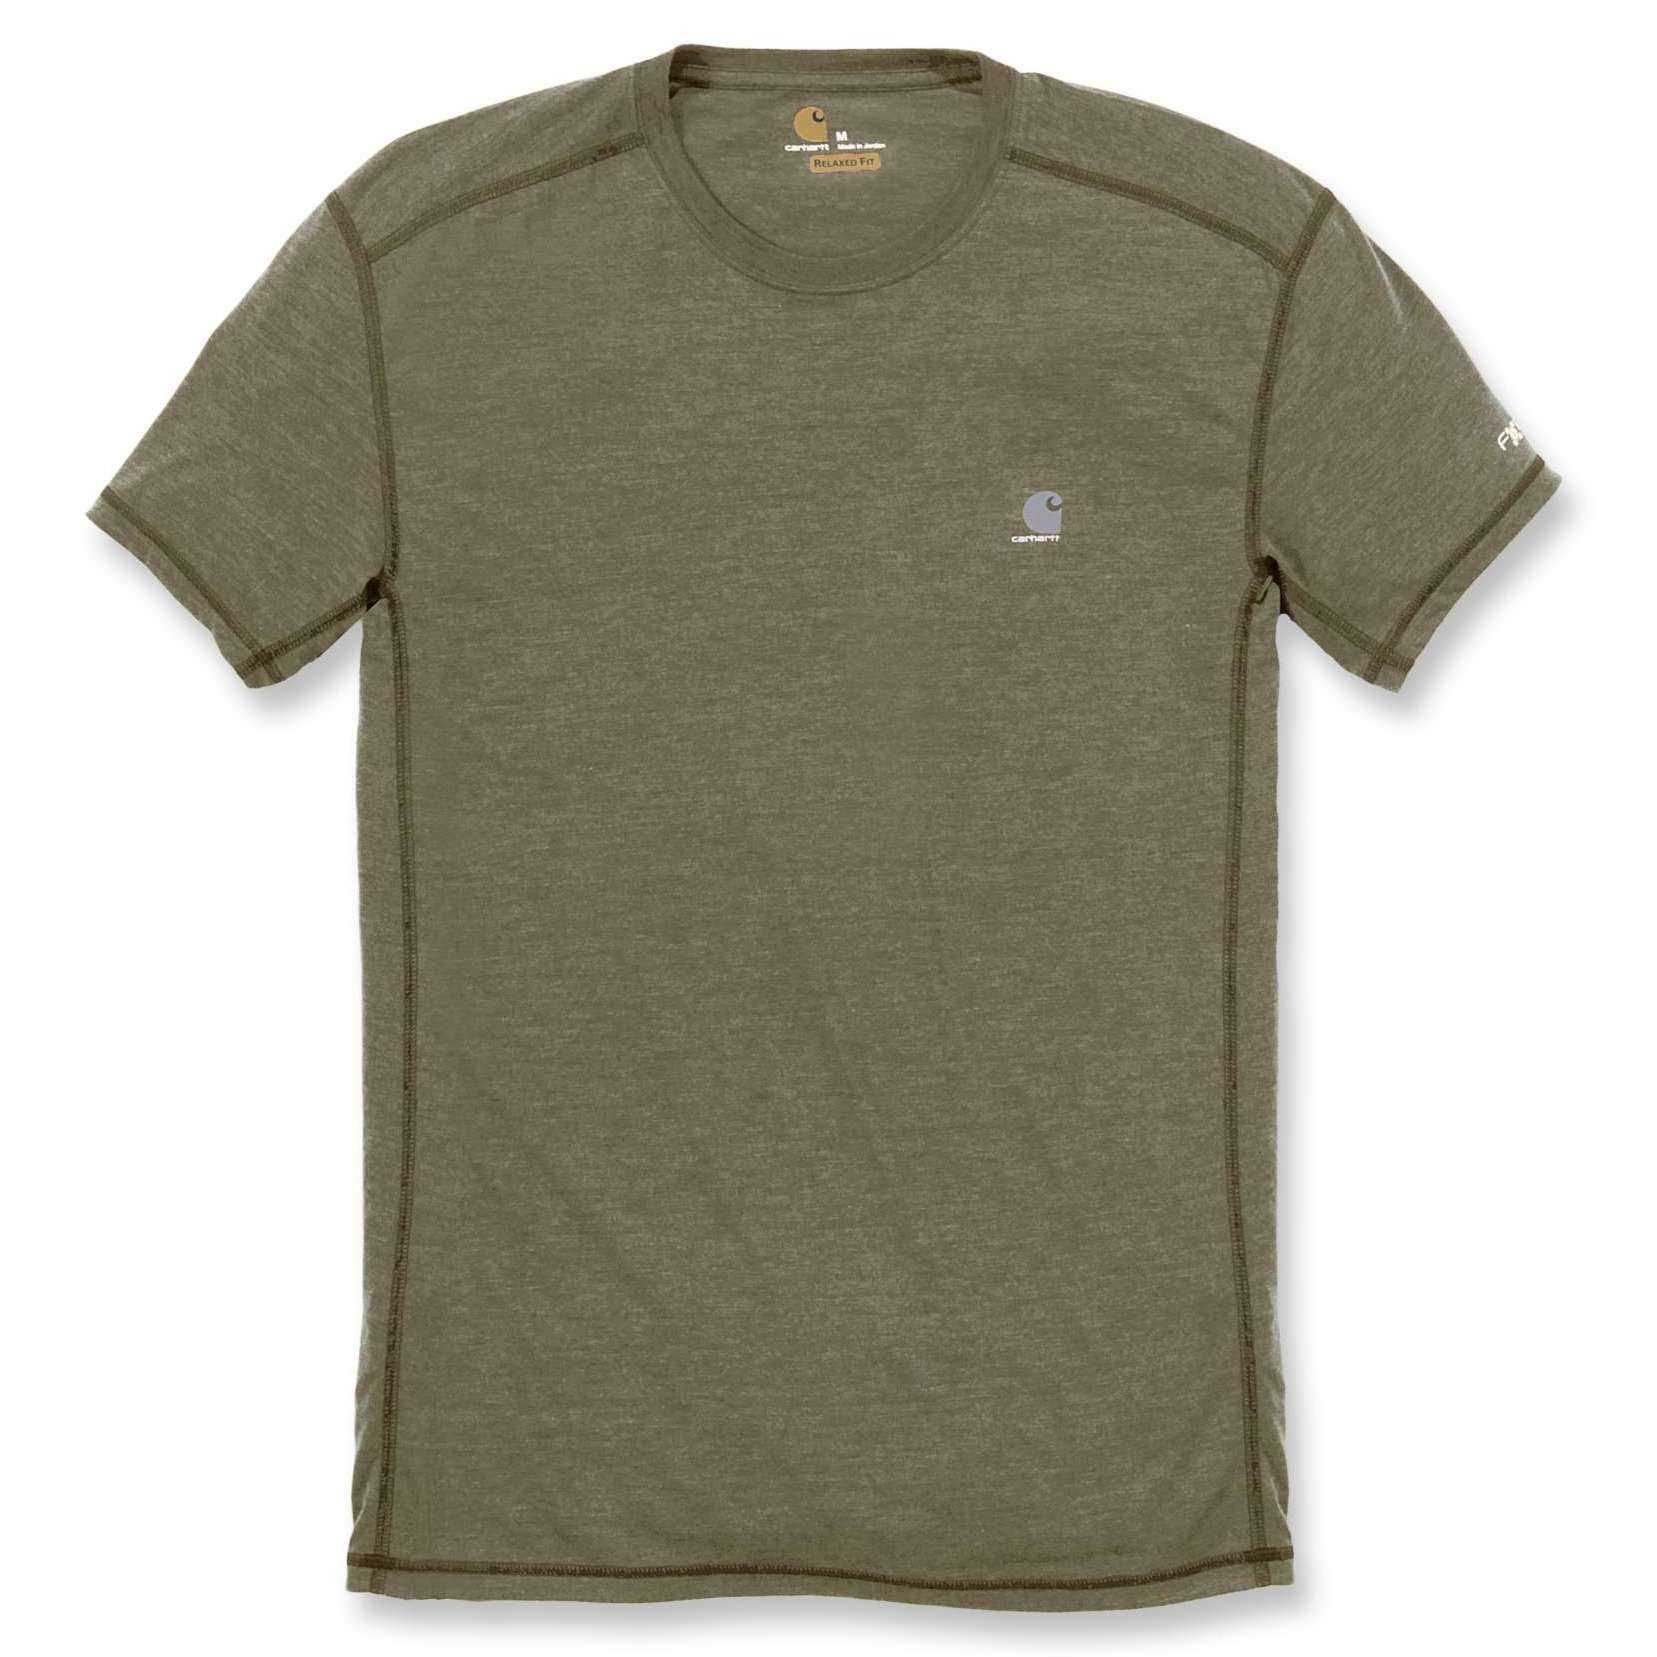 Футболка Carhartt Force Extremes T-Shirt S/S - 102960 (Burnt Olive Heather; S)